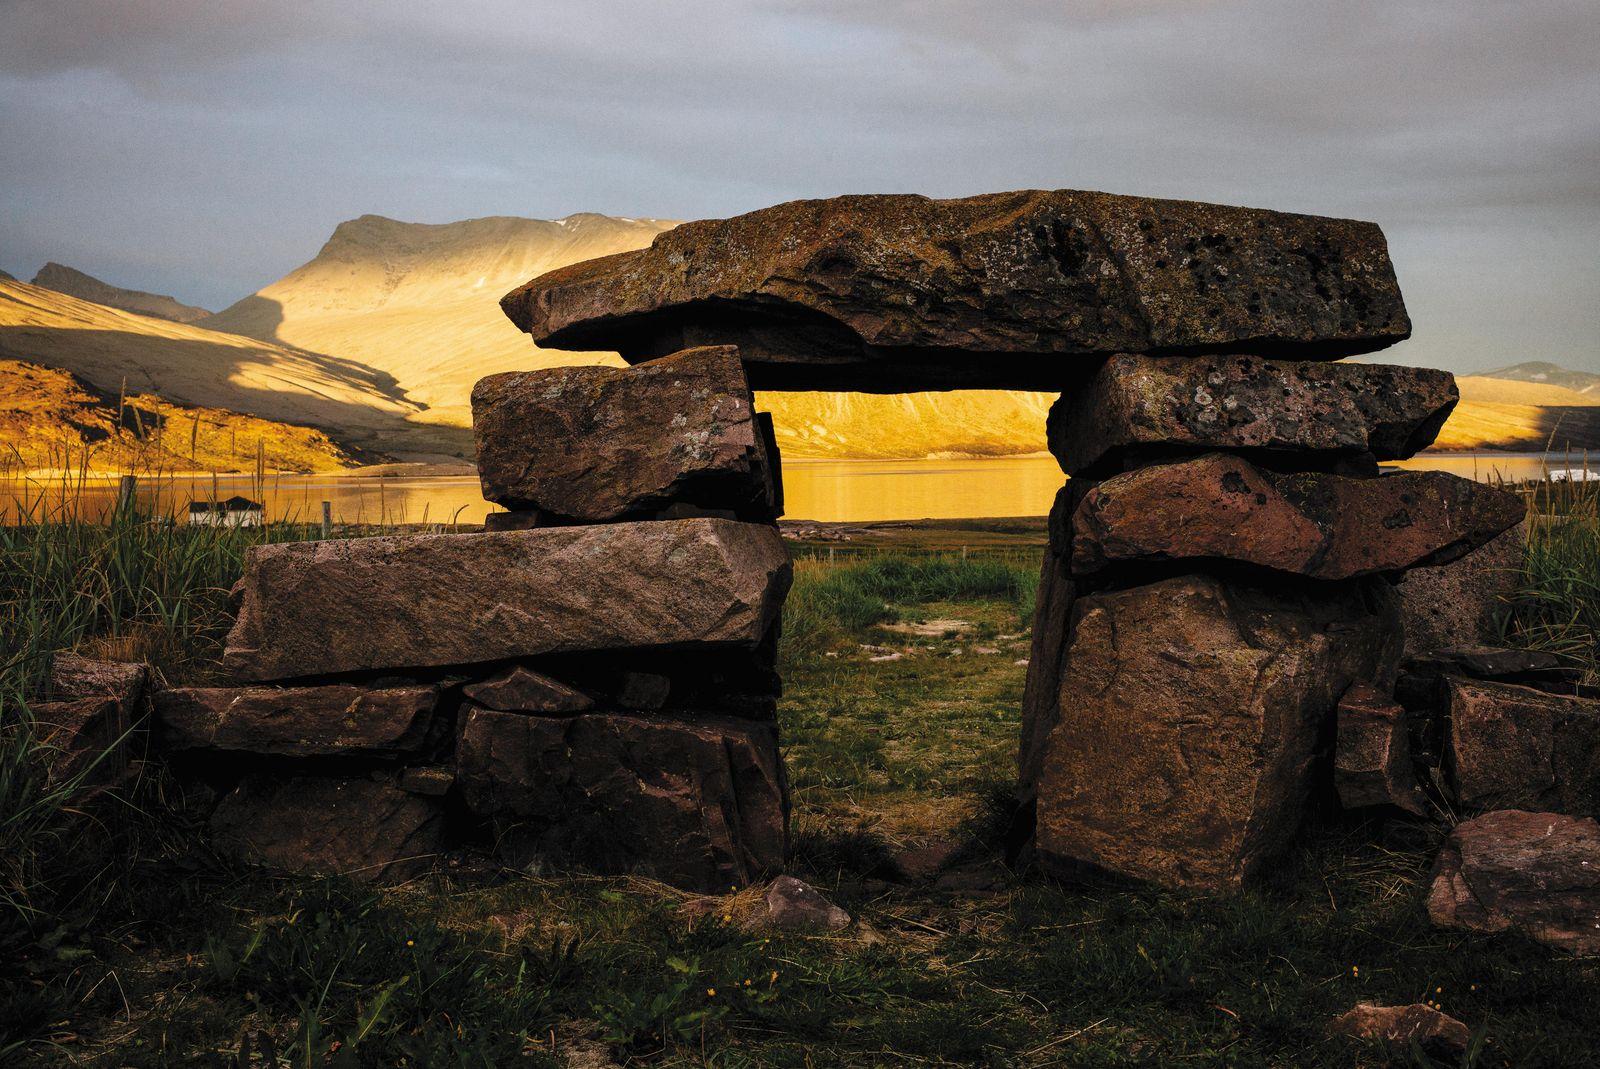 Why Did Greenland's Vikings Vanish?